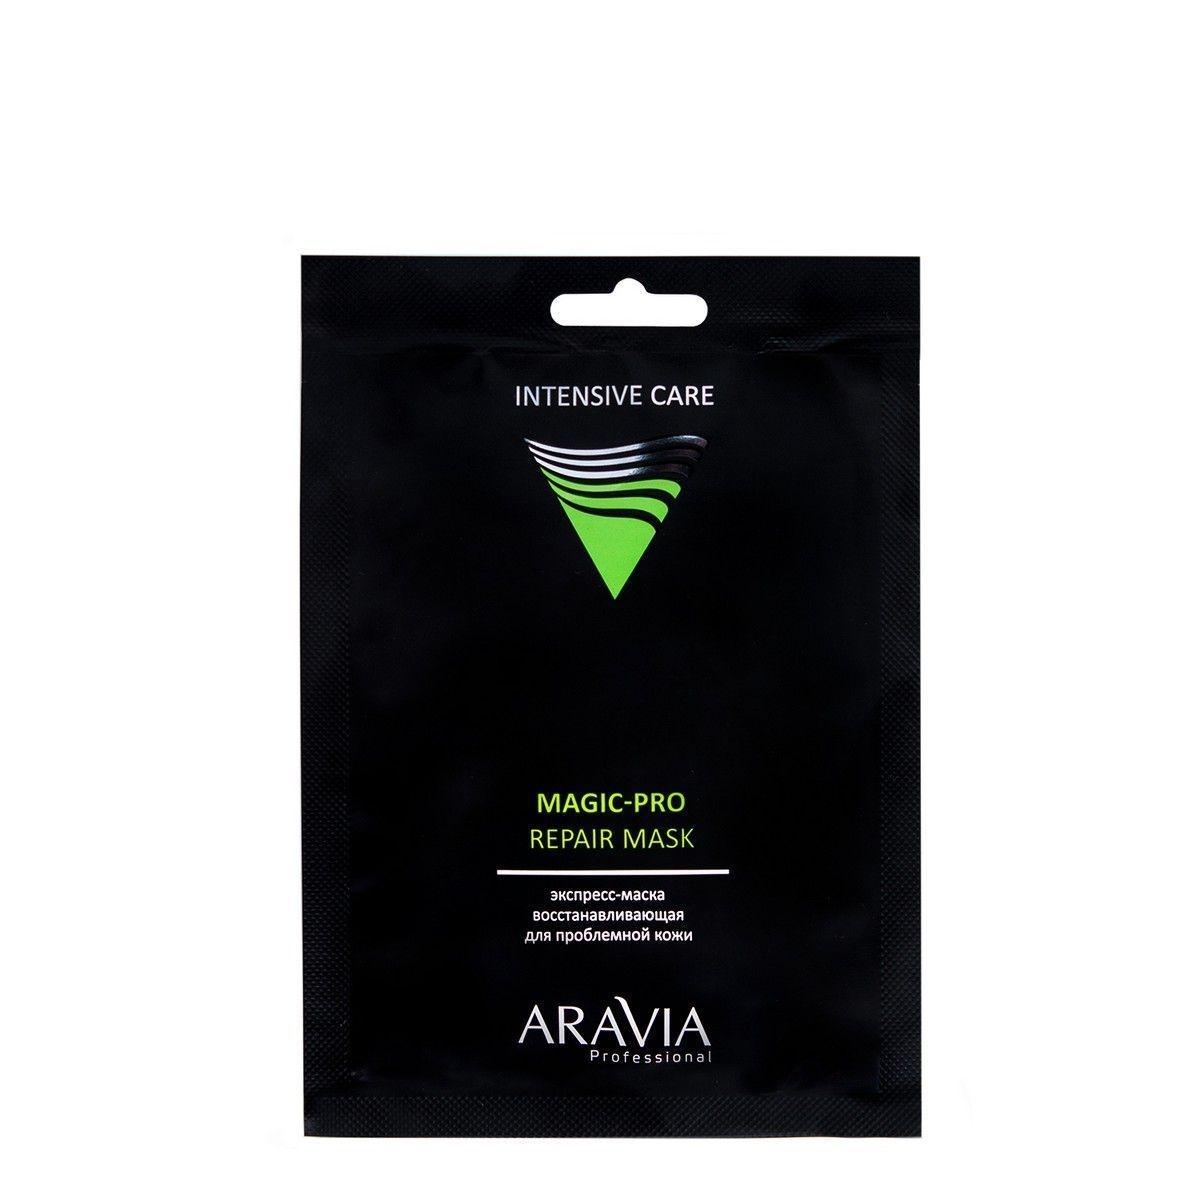 ARAVIA Экспресс-Маска Восстанавливающая для Проблемной Кожи Magic Pro Repair Mask, 1 шт